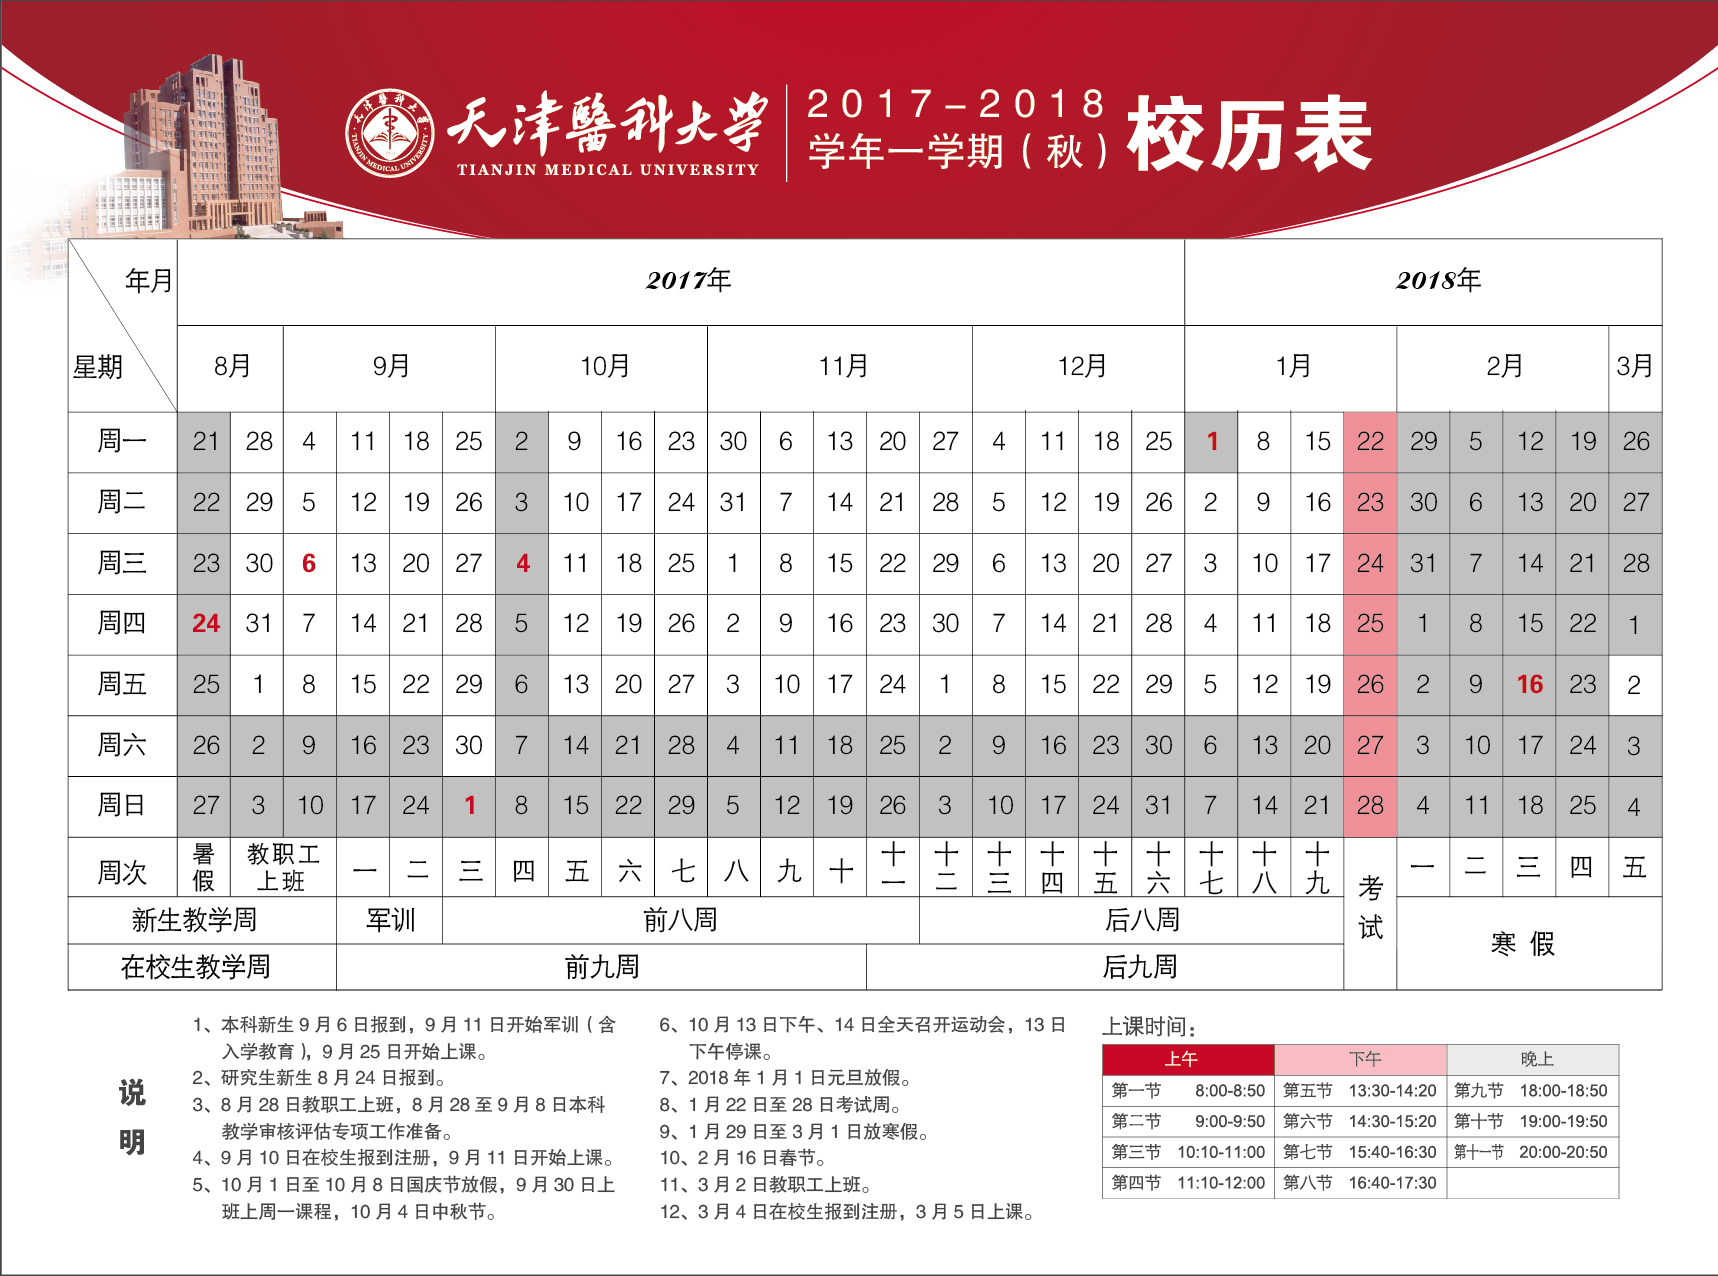 2019gtp排行_2019世界最权威十大大学排名发布,华东上榜高校最多